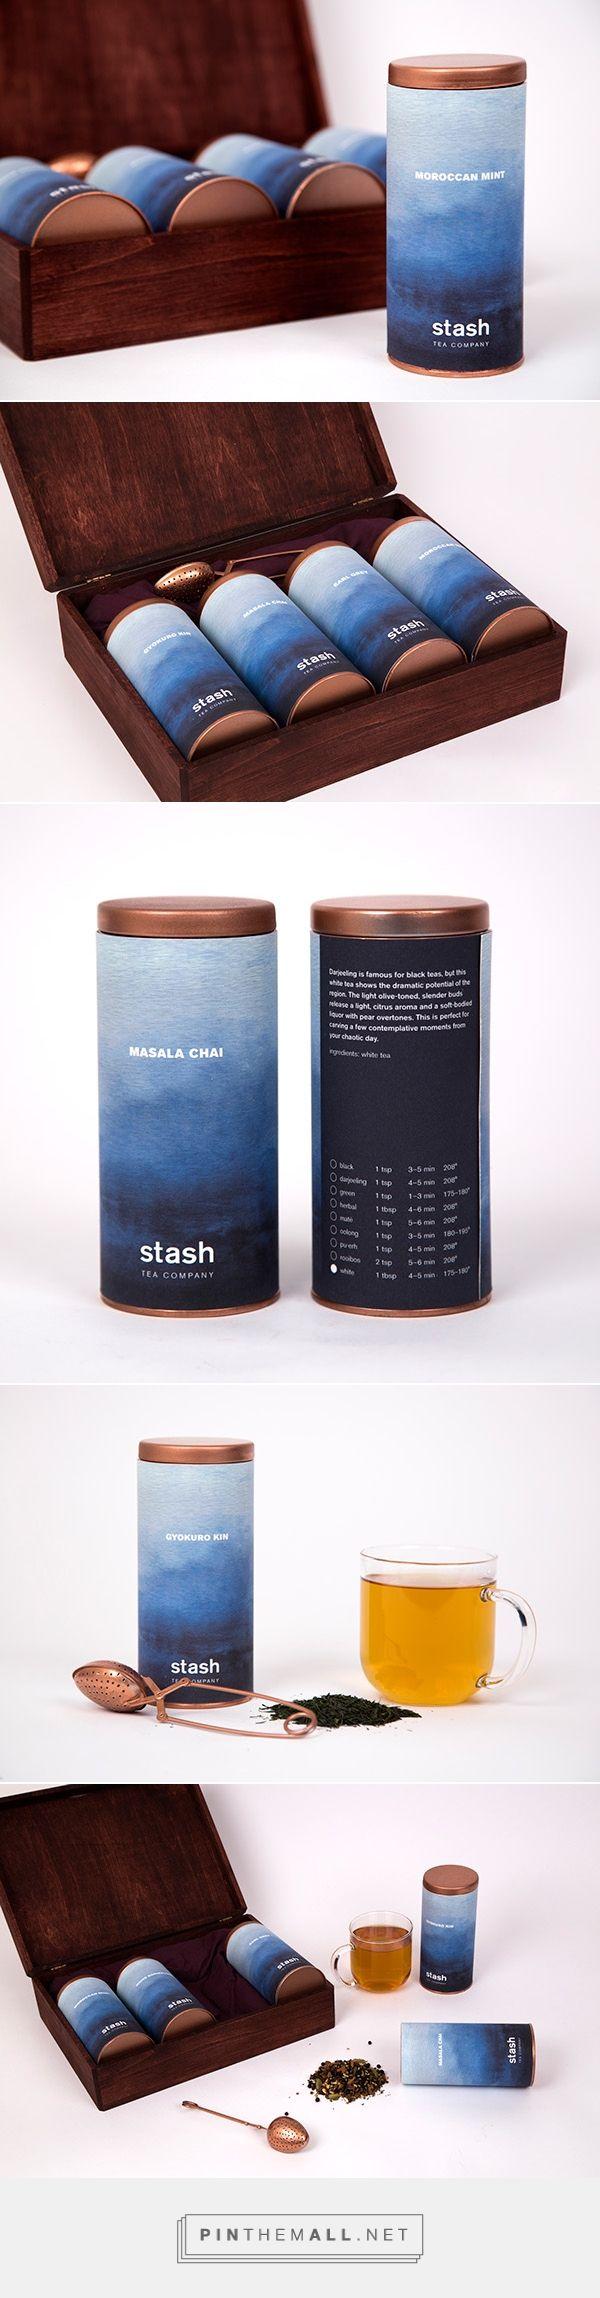 27 Beautiful Packaging Designs 23